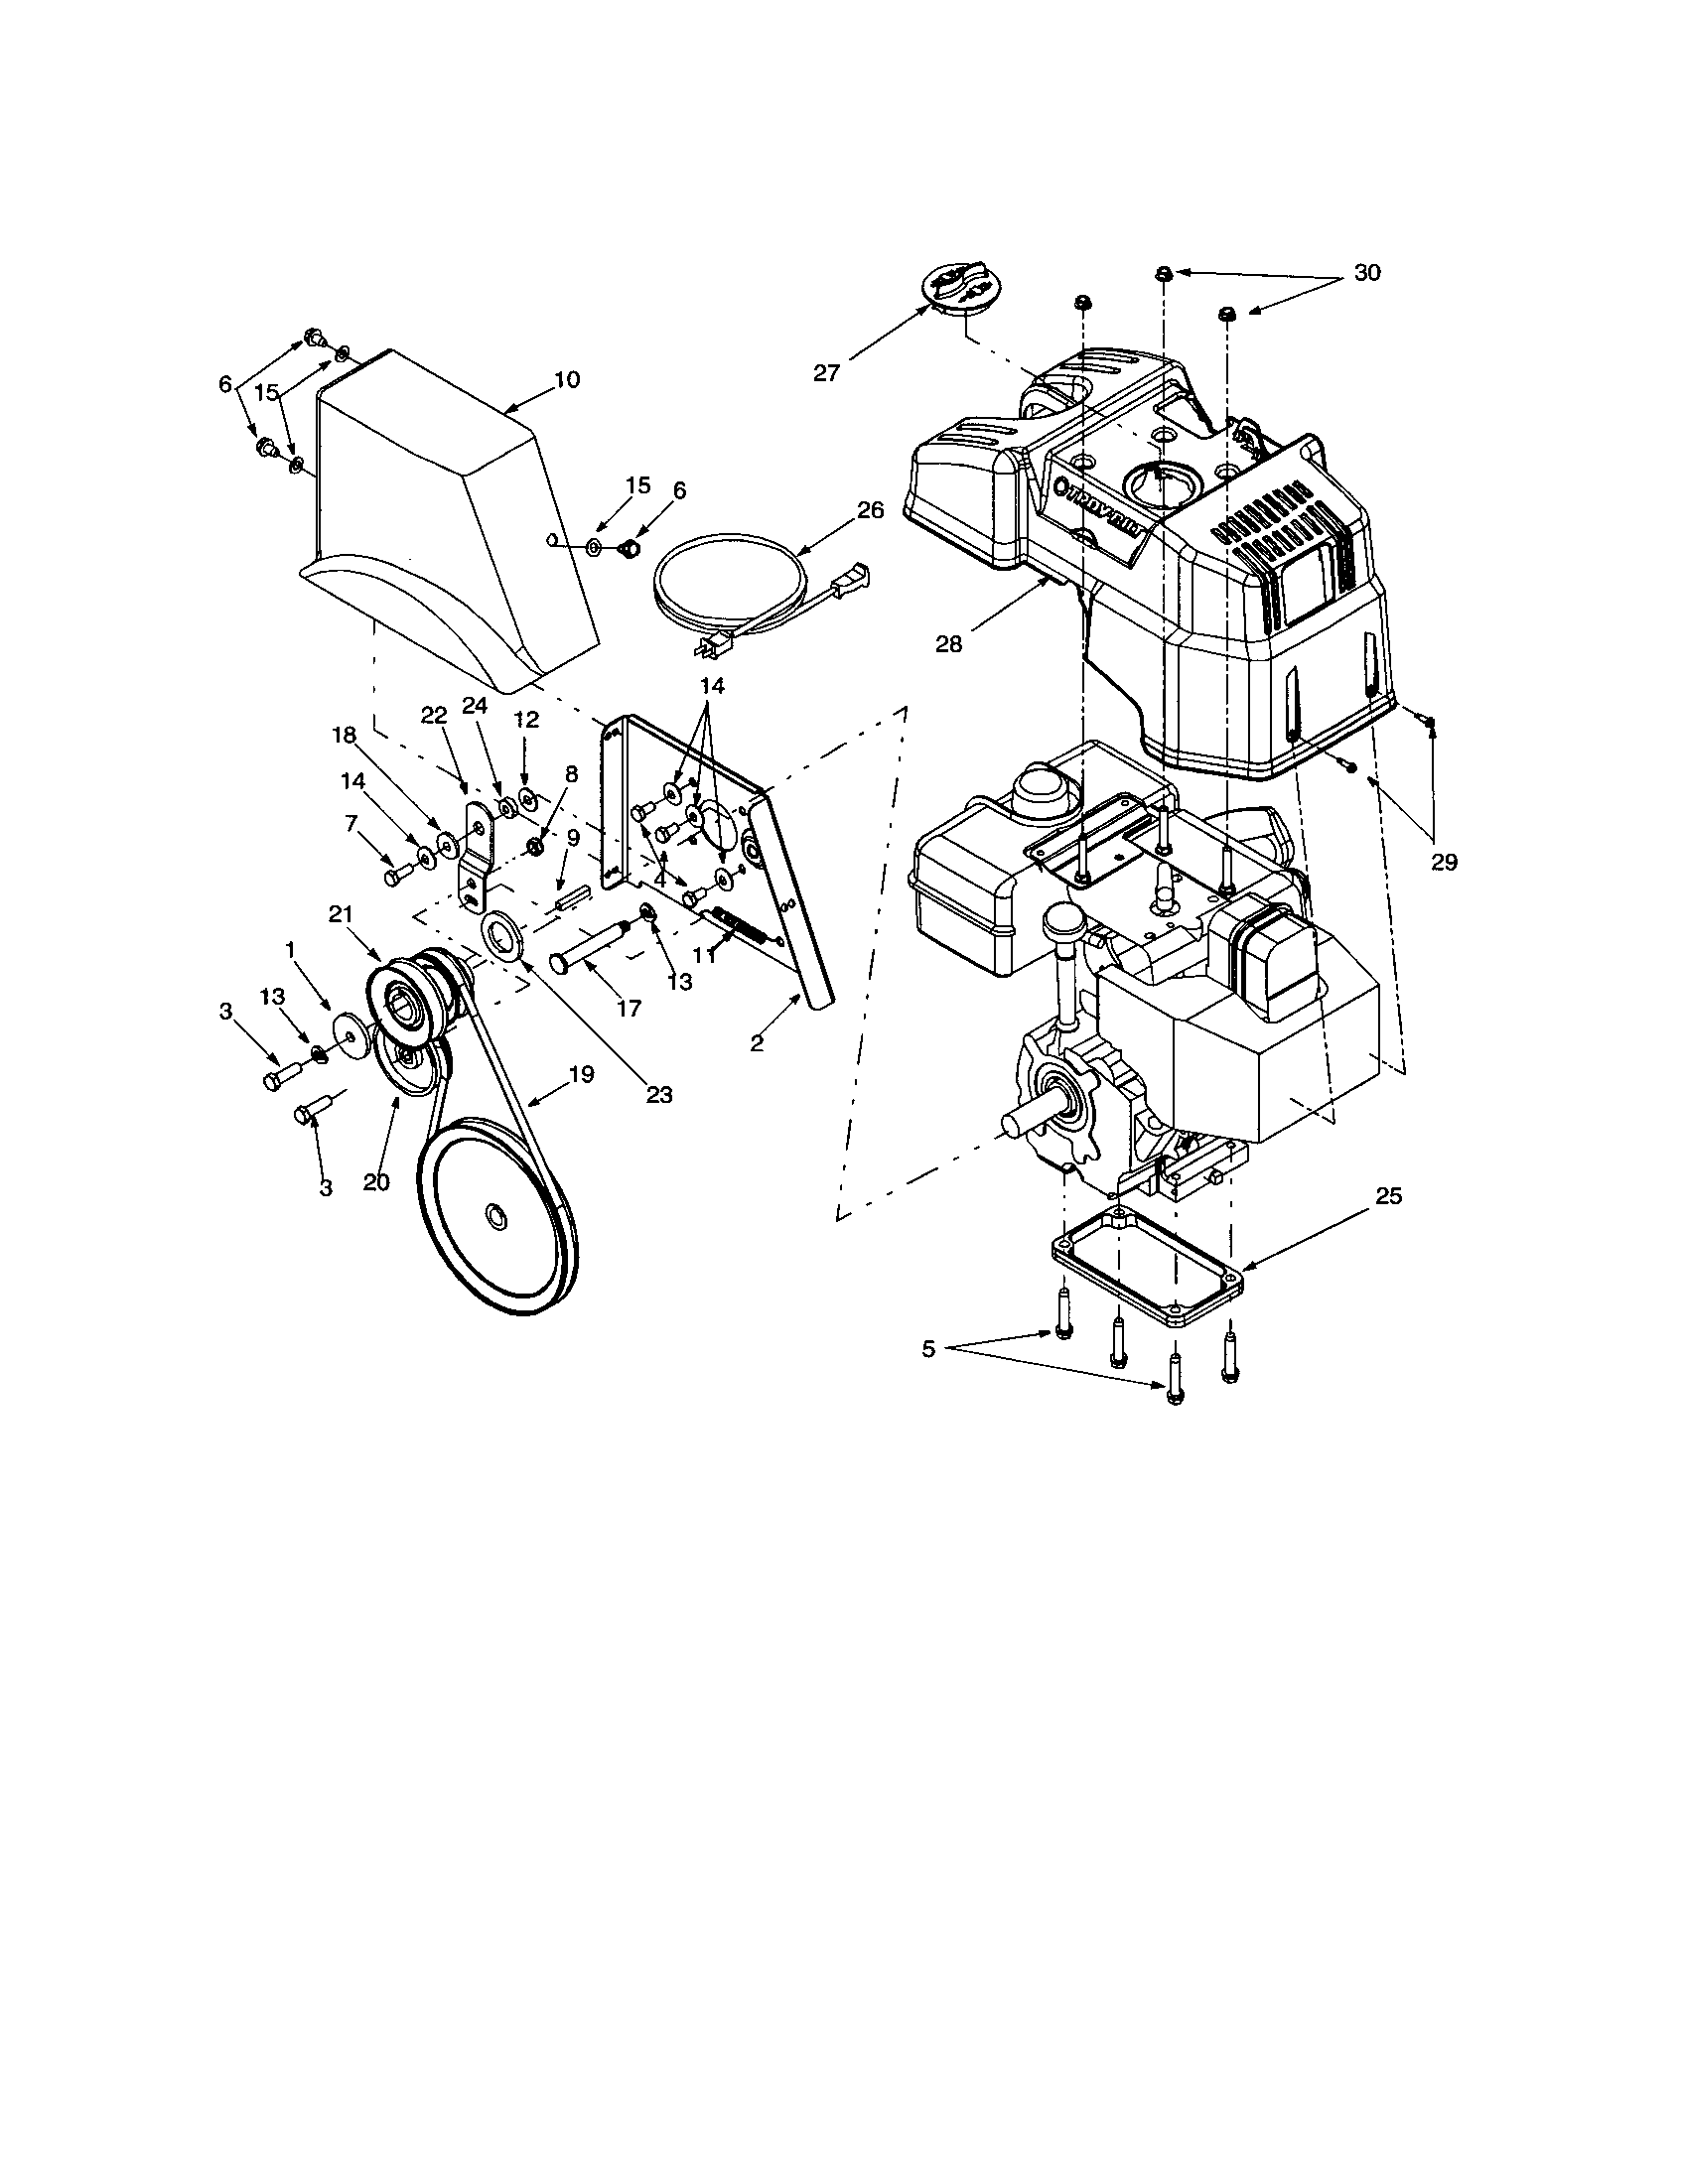 [DIAGRAM] Bobcat 1812 Snowblower Wire Diagrams FULL